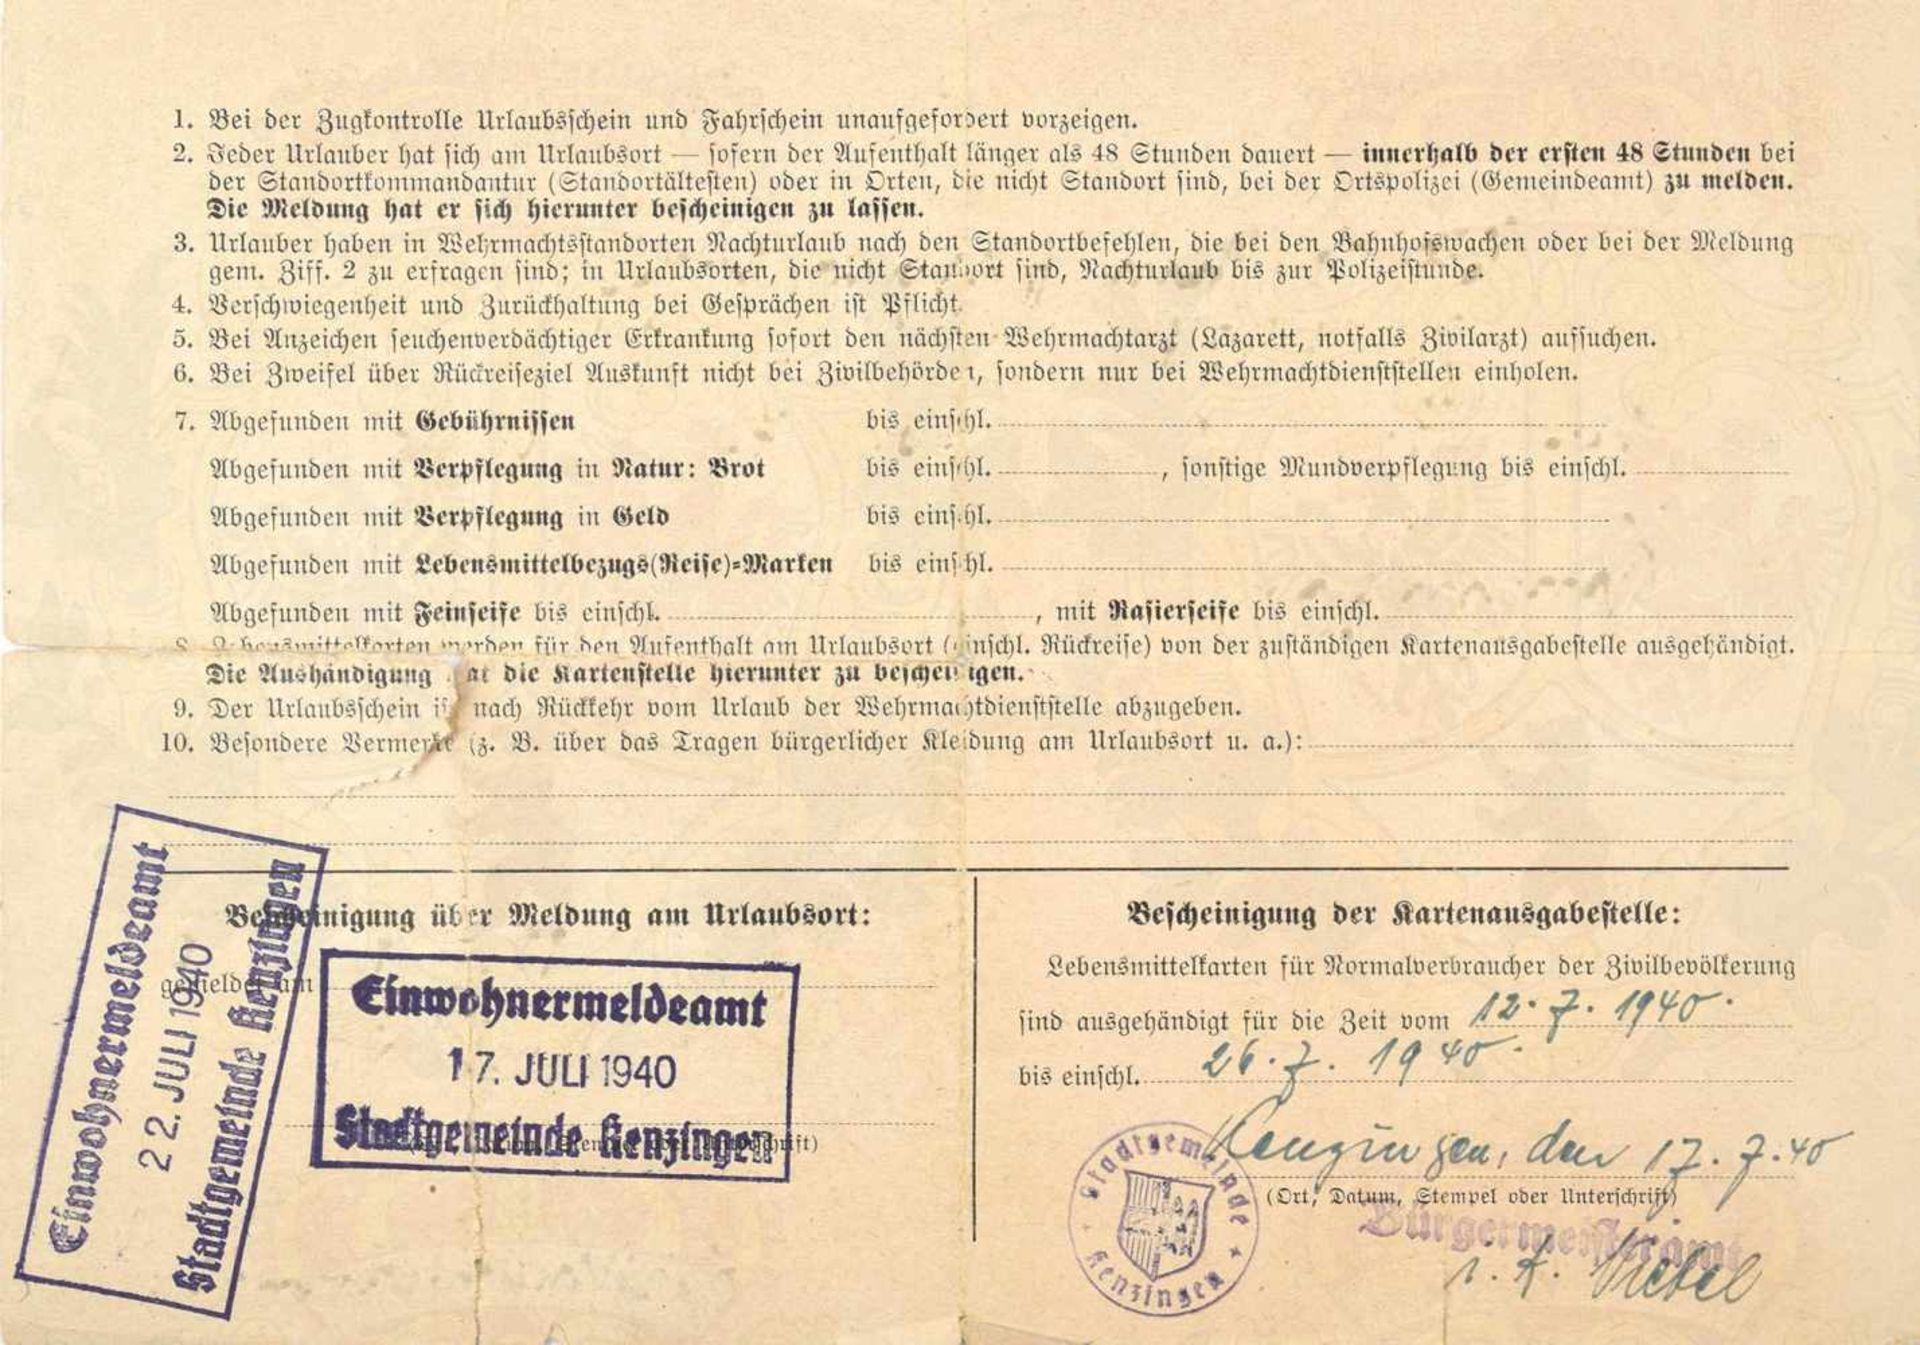 Los 7 - PRIEN, GÜNTHER, (1908-1941, im Nordatlantik verschollen), Korvettenkapitän u. Kdt. von U-47, EL